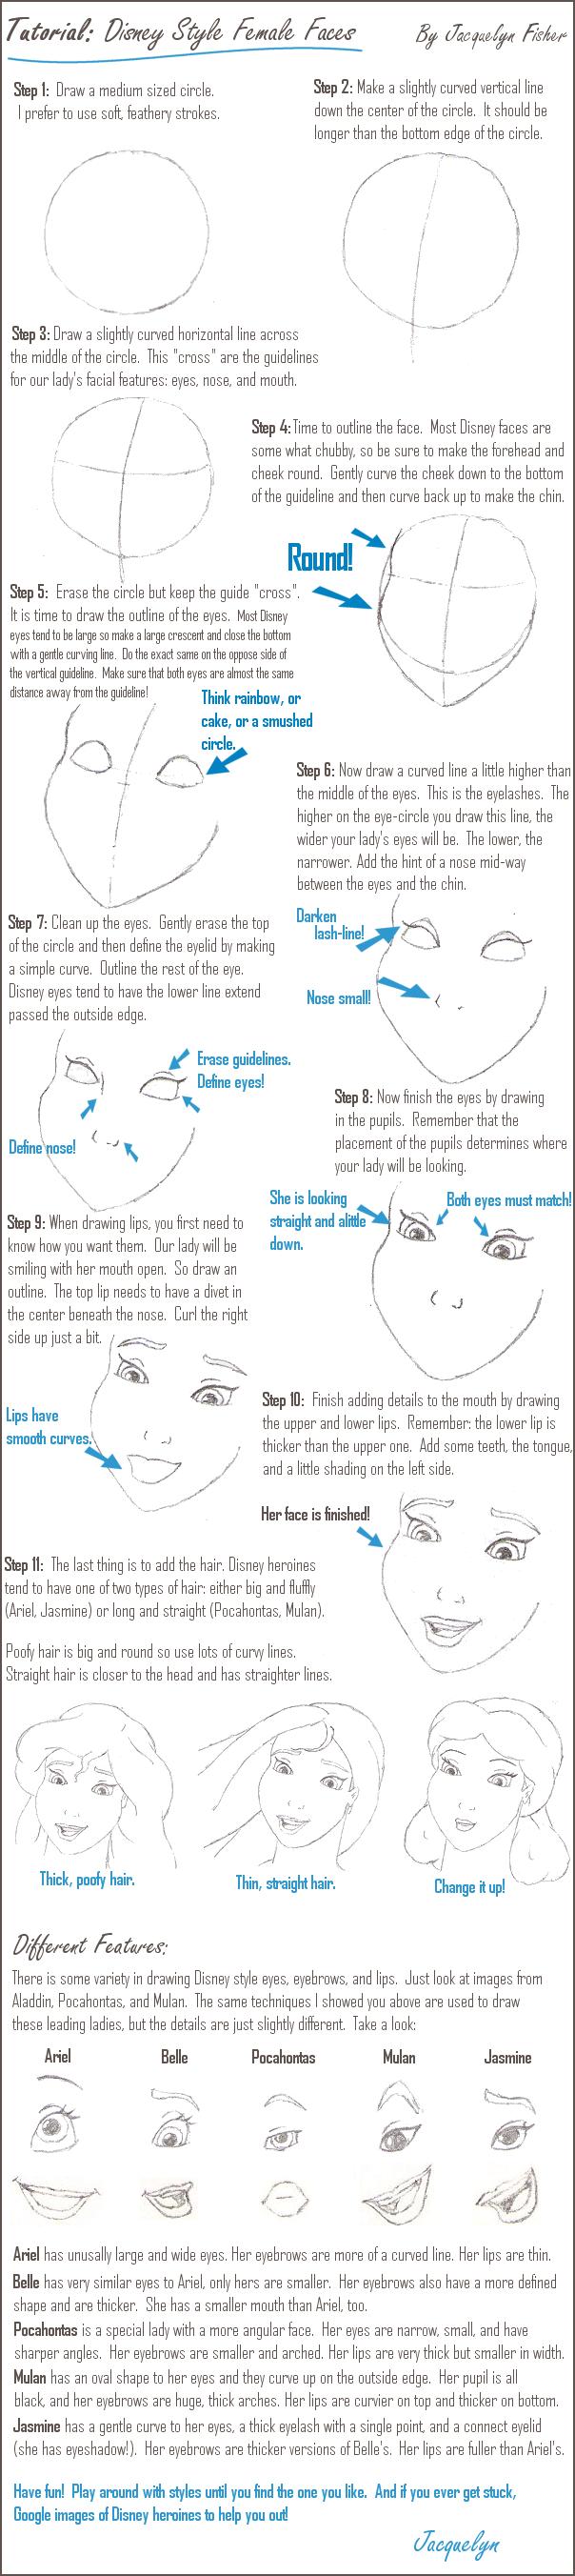 How To Draw Eyes Like Disney By V C Andrews Jacquelynvansant Tutorial:  Disney Female Faces By Jacquelynvansant